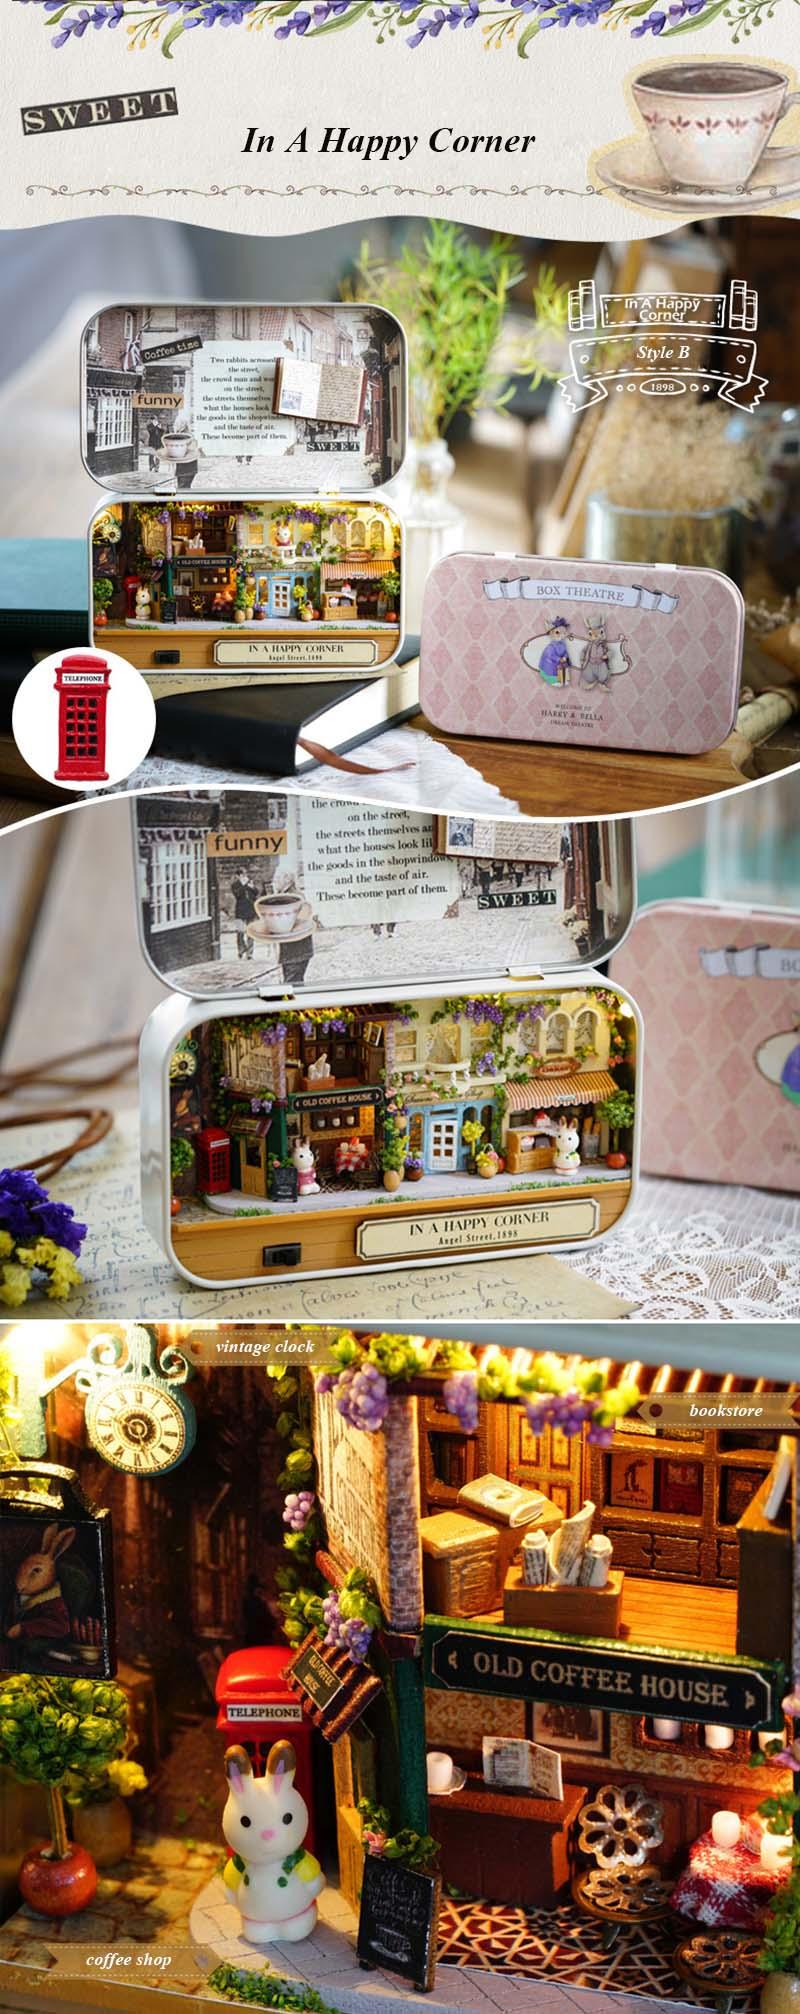 Dollhouse Mini Bento Lunch Boxs Food Container Storage Doll Kitchen Decor Toy TB